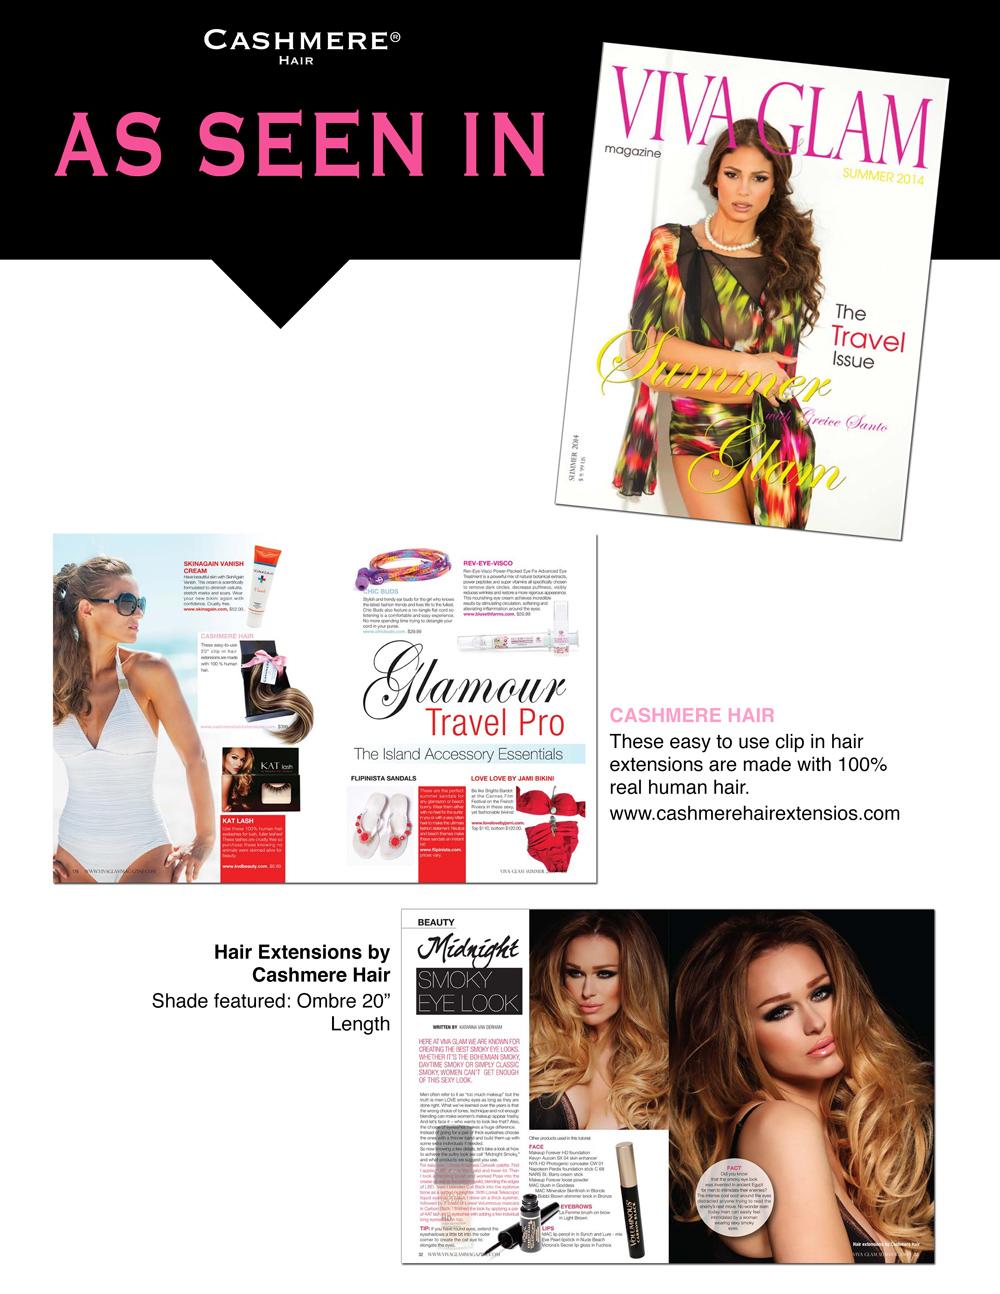 viva-glam-magazine-summer-2014a.jpg